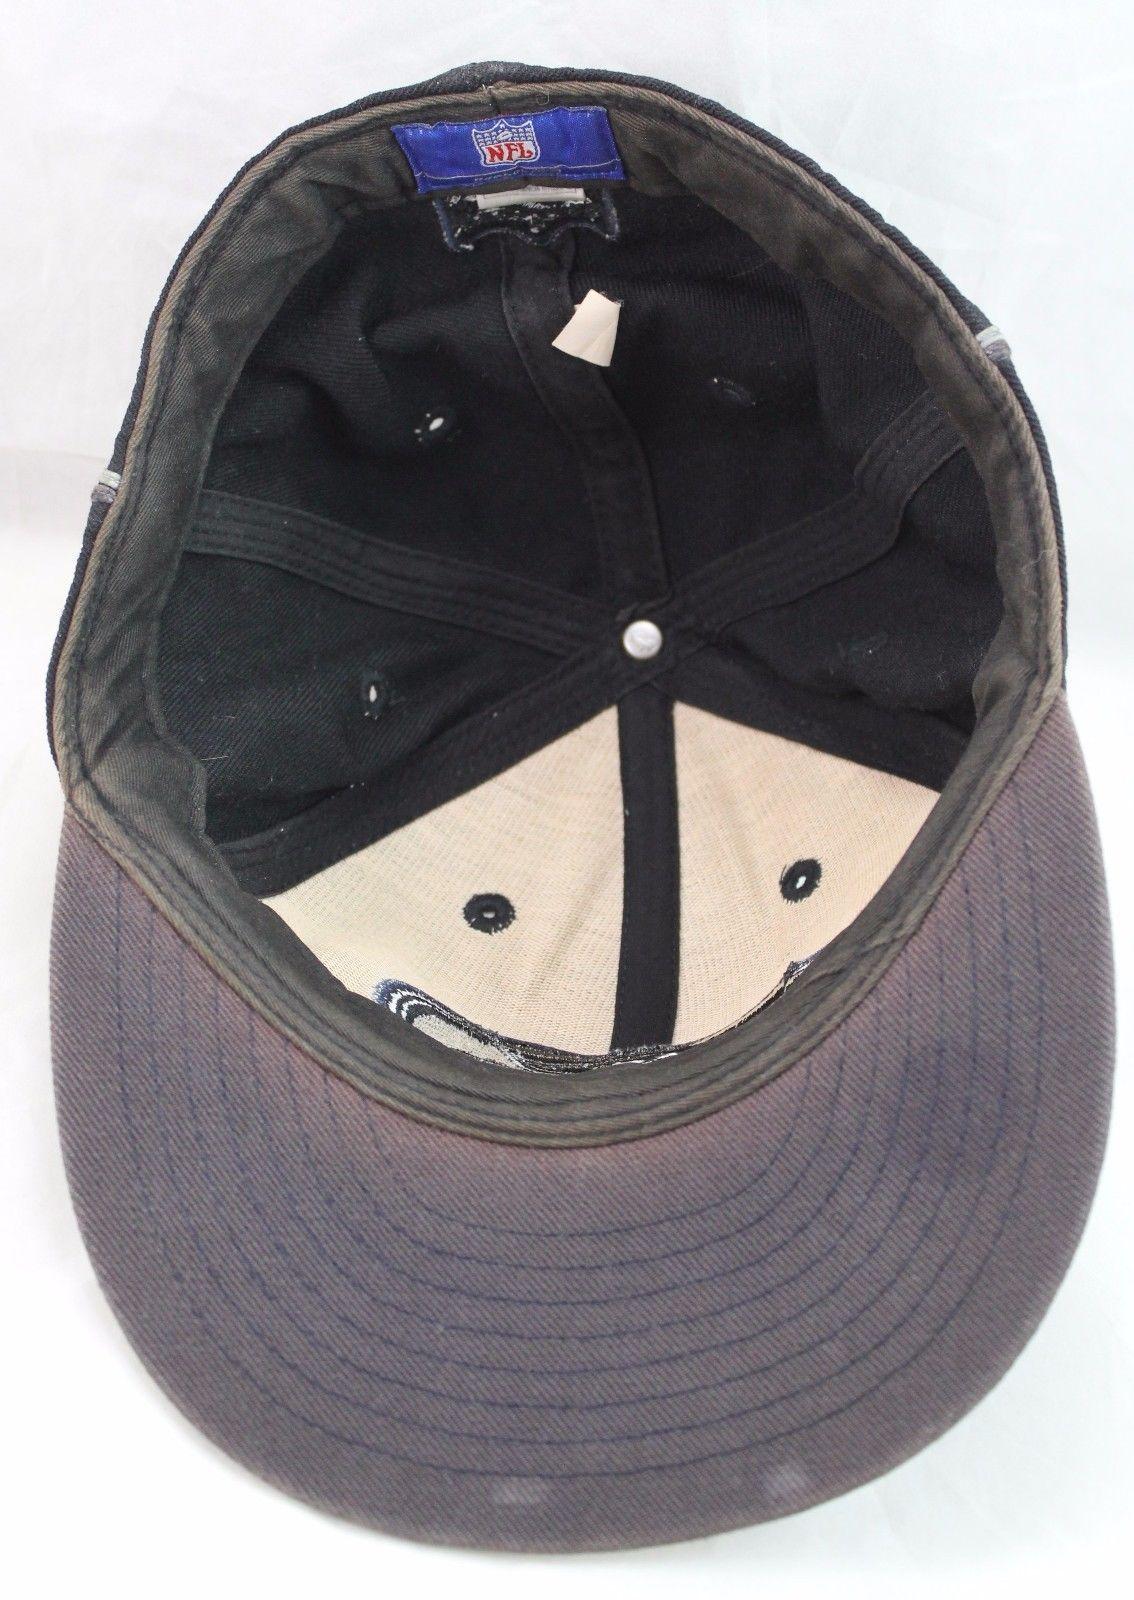 9887183f37d Seattle Seahawks NFL Football Dark Embroidered Black Reebok Cap Hat 7-3 8